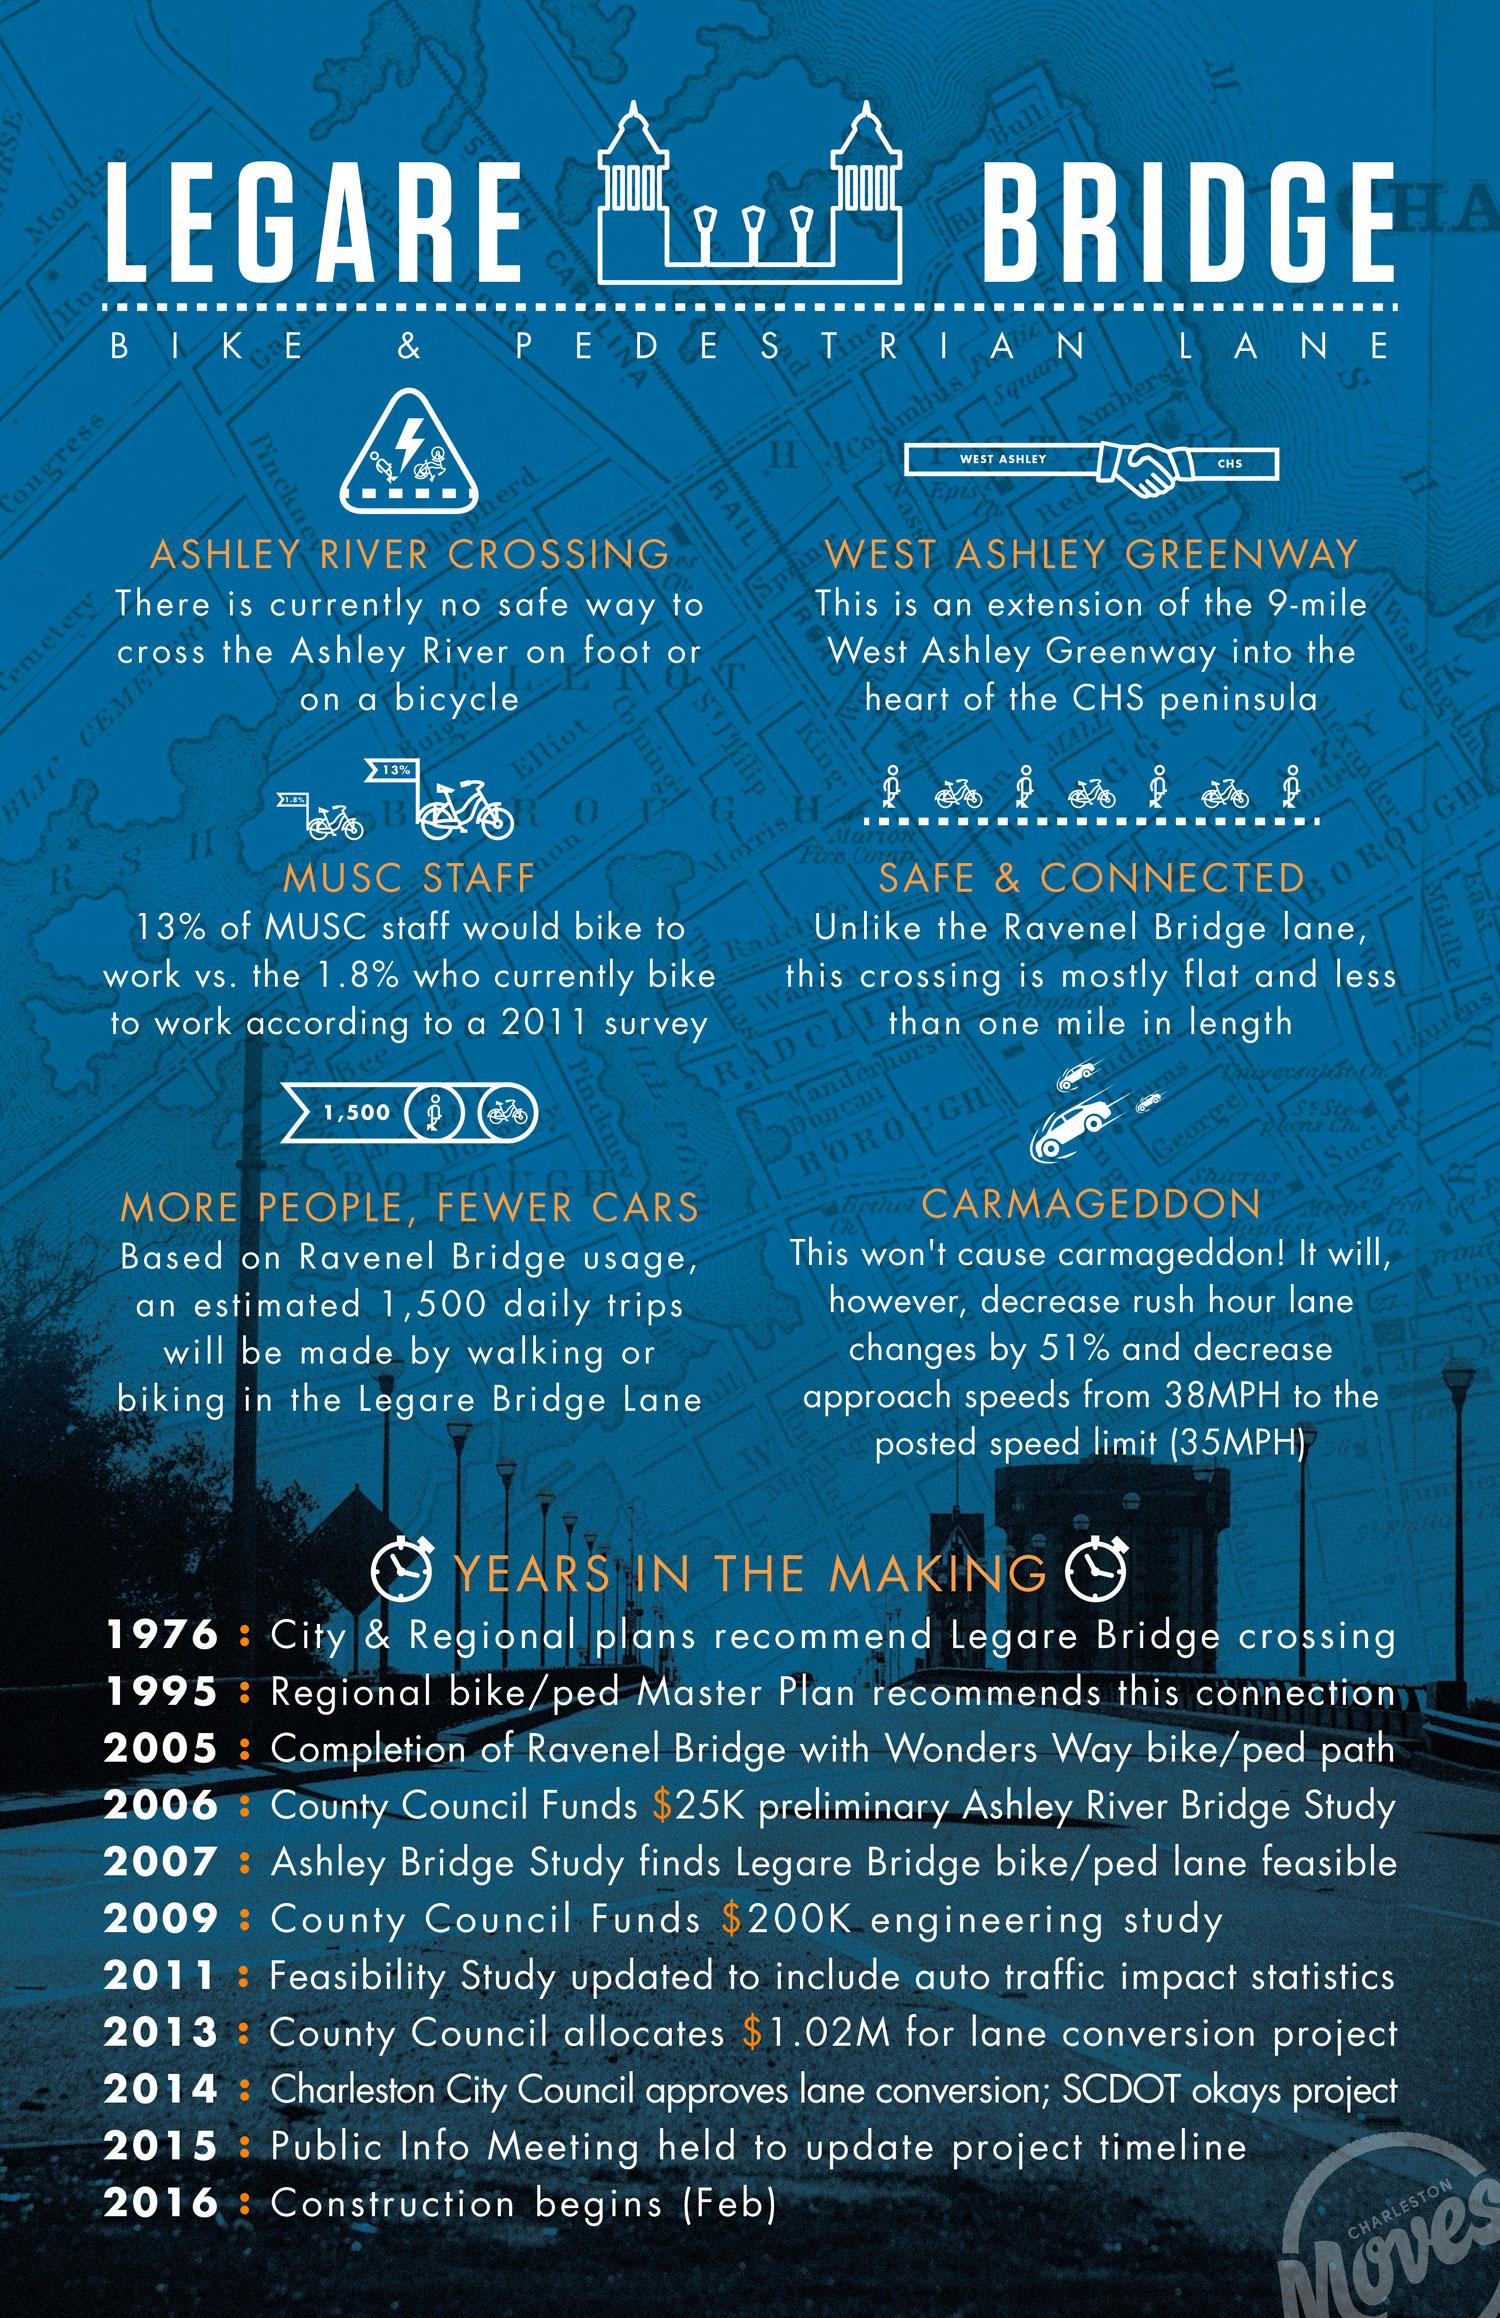 Legare-Bridge-Lane-Benefits-&-Timeline